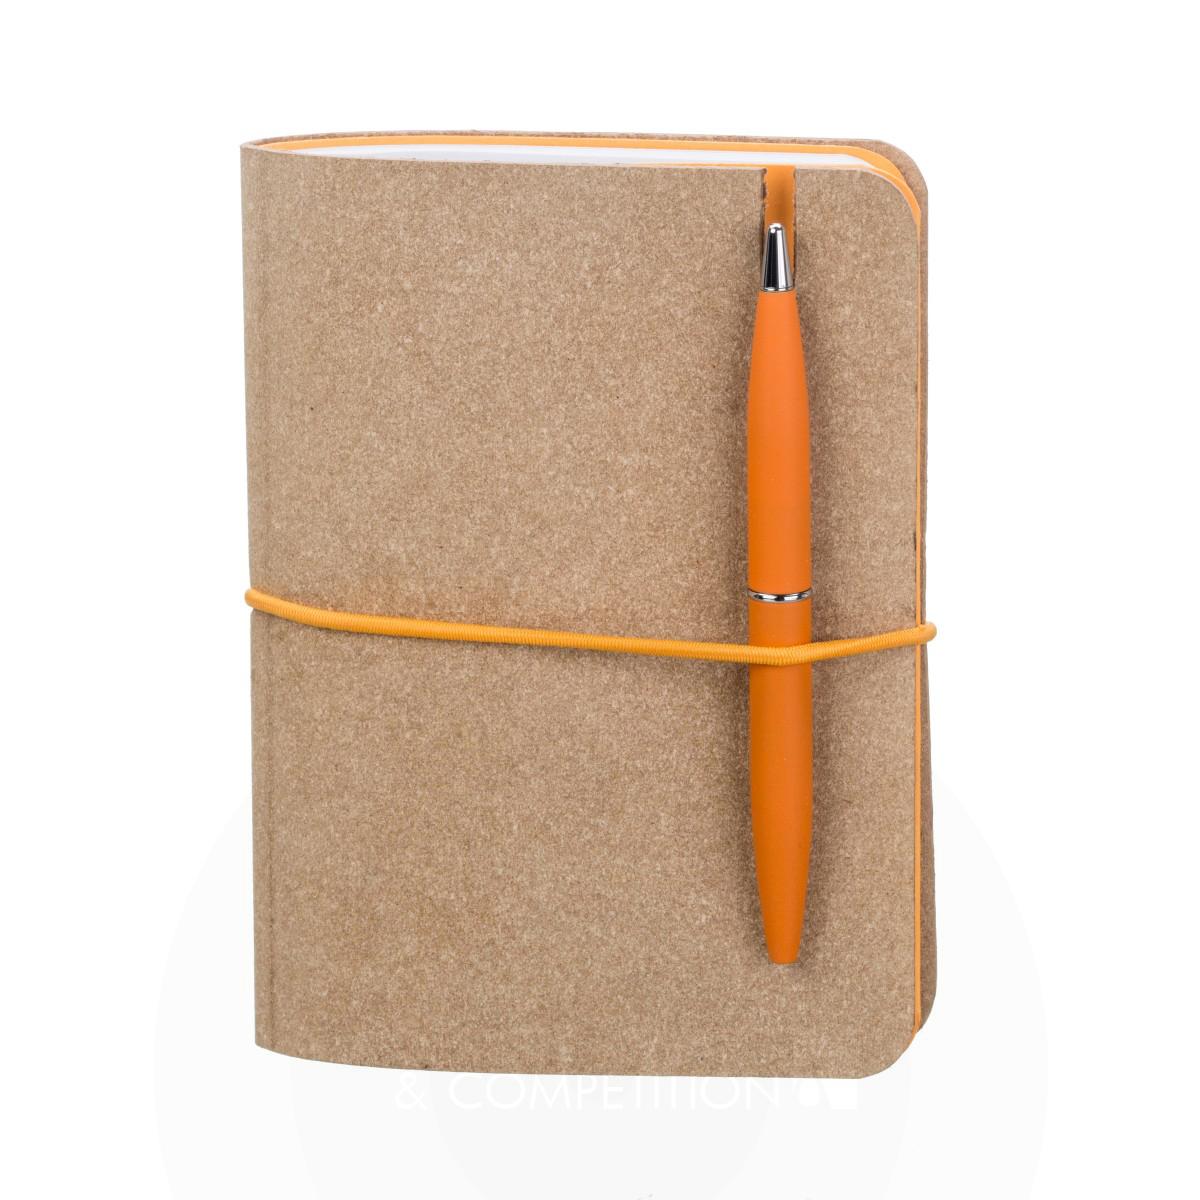 Pocket Refillable notebook